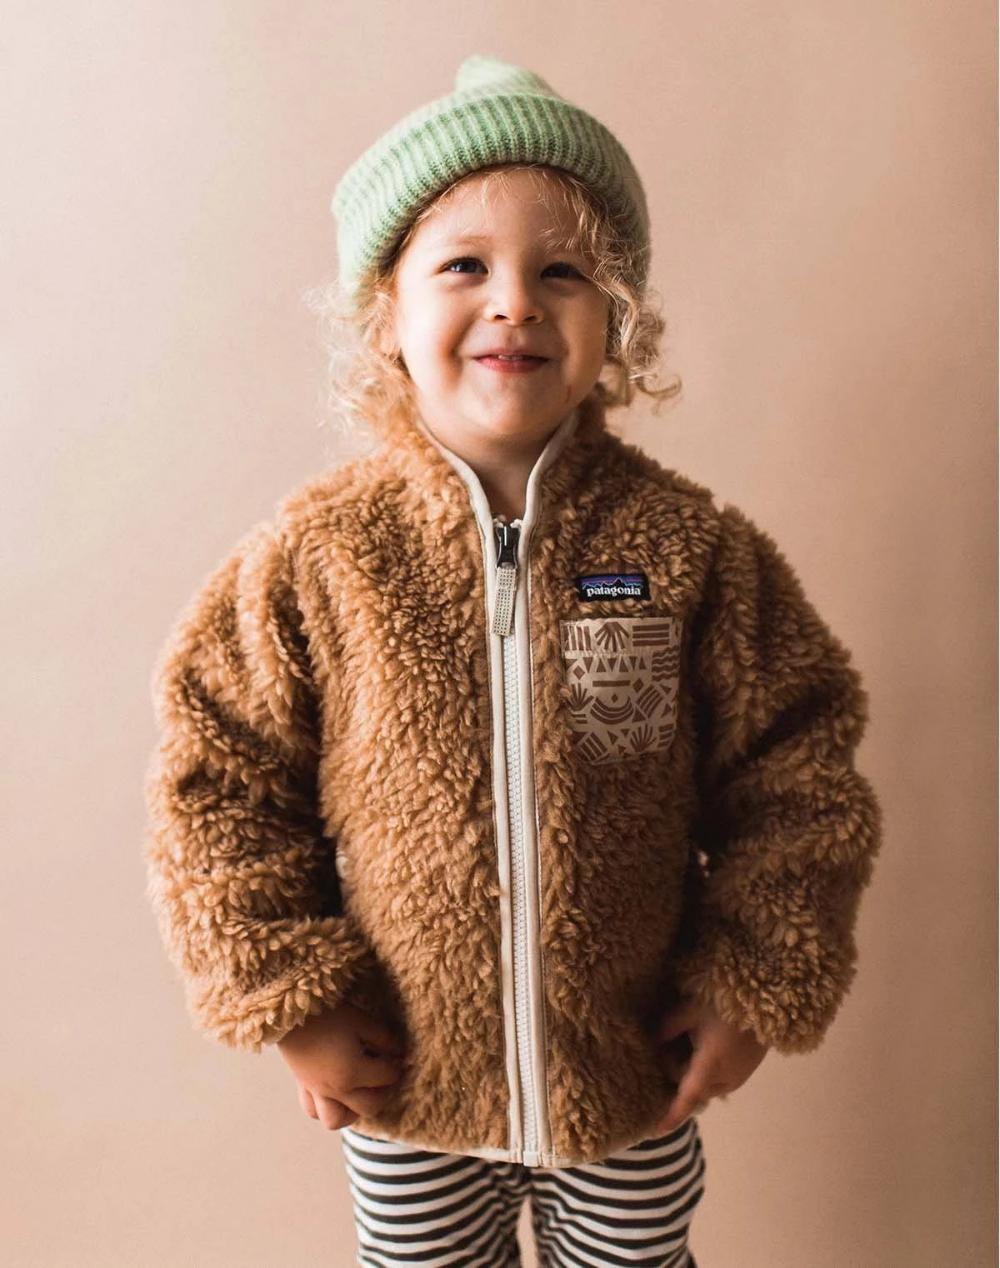 patagonia teddy jacke kinder